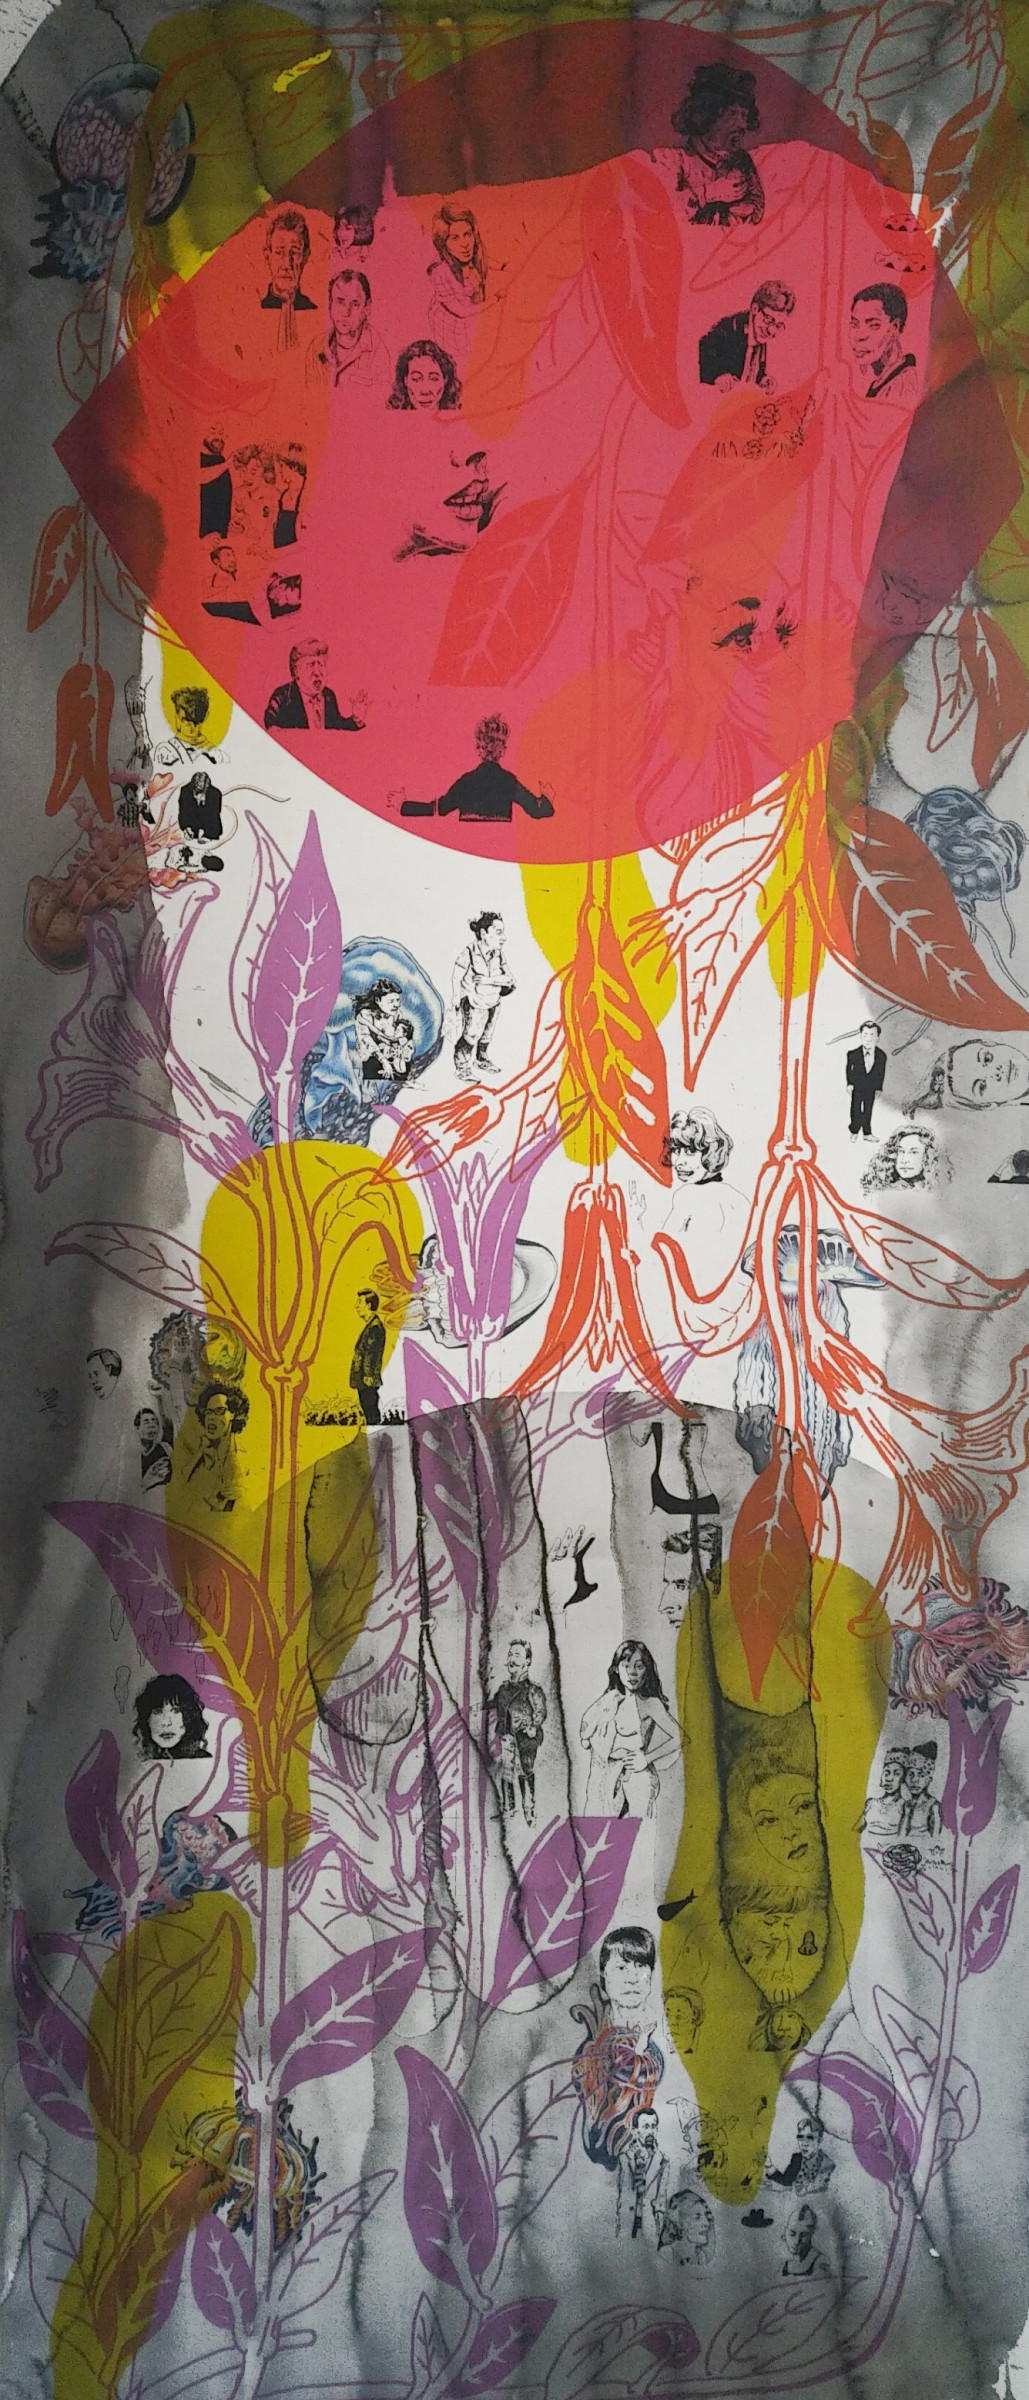 <span class=&#34;link fancybox-details-link&#34;><a href=&#34;/artists/51-florentine-%26-alexandre-lamarche-ovize/works/9591/&#34;>View Detail Page</a></span><div class=&#34;artist&#34;><strong>Florentine & Alexandre LAMARCHE-OVIZE</strong></div> <div class=&#34;title&#34;><em>The never ending picture</em>, 2018</div> <div class=&#34;medium&#34;>silkscreen and ink</div> <div class=&#34;dimensions&#34;>106 x 240 cm<br /> 41 3/4 x 94 1/2 in</div> <div class=&#34;edition_details&#34;>Edition of 3</div><div class=&#34;copyright_line&#34;>Copyright The Artist</div>